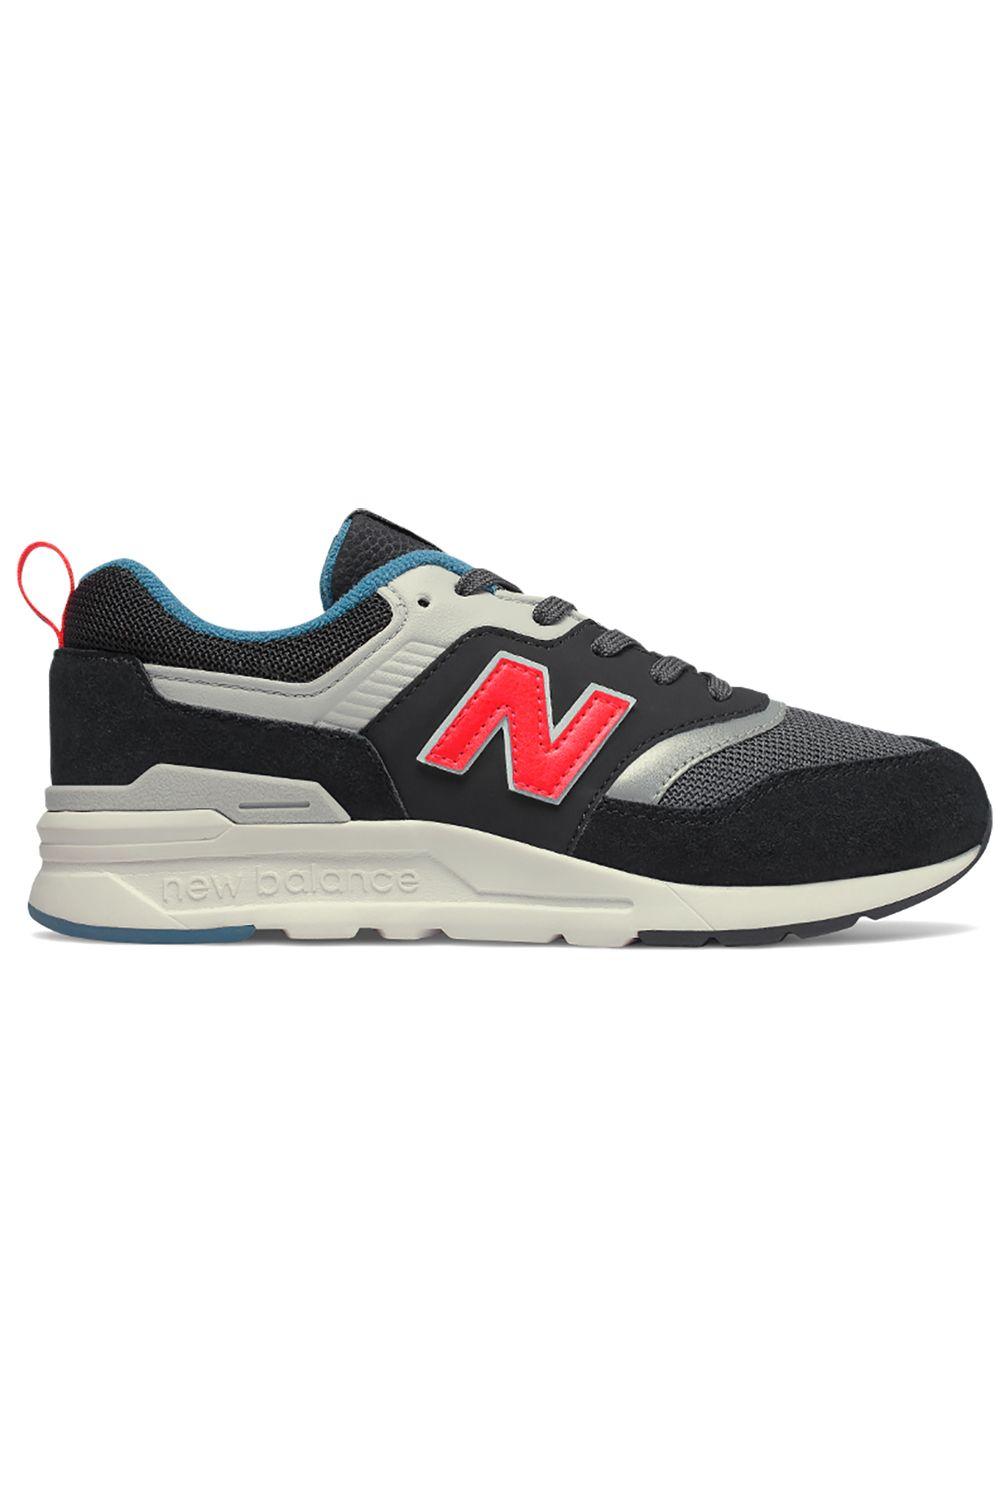 Tenis New Balance GR997HAI Black/Red